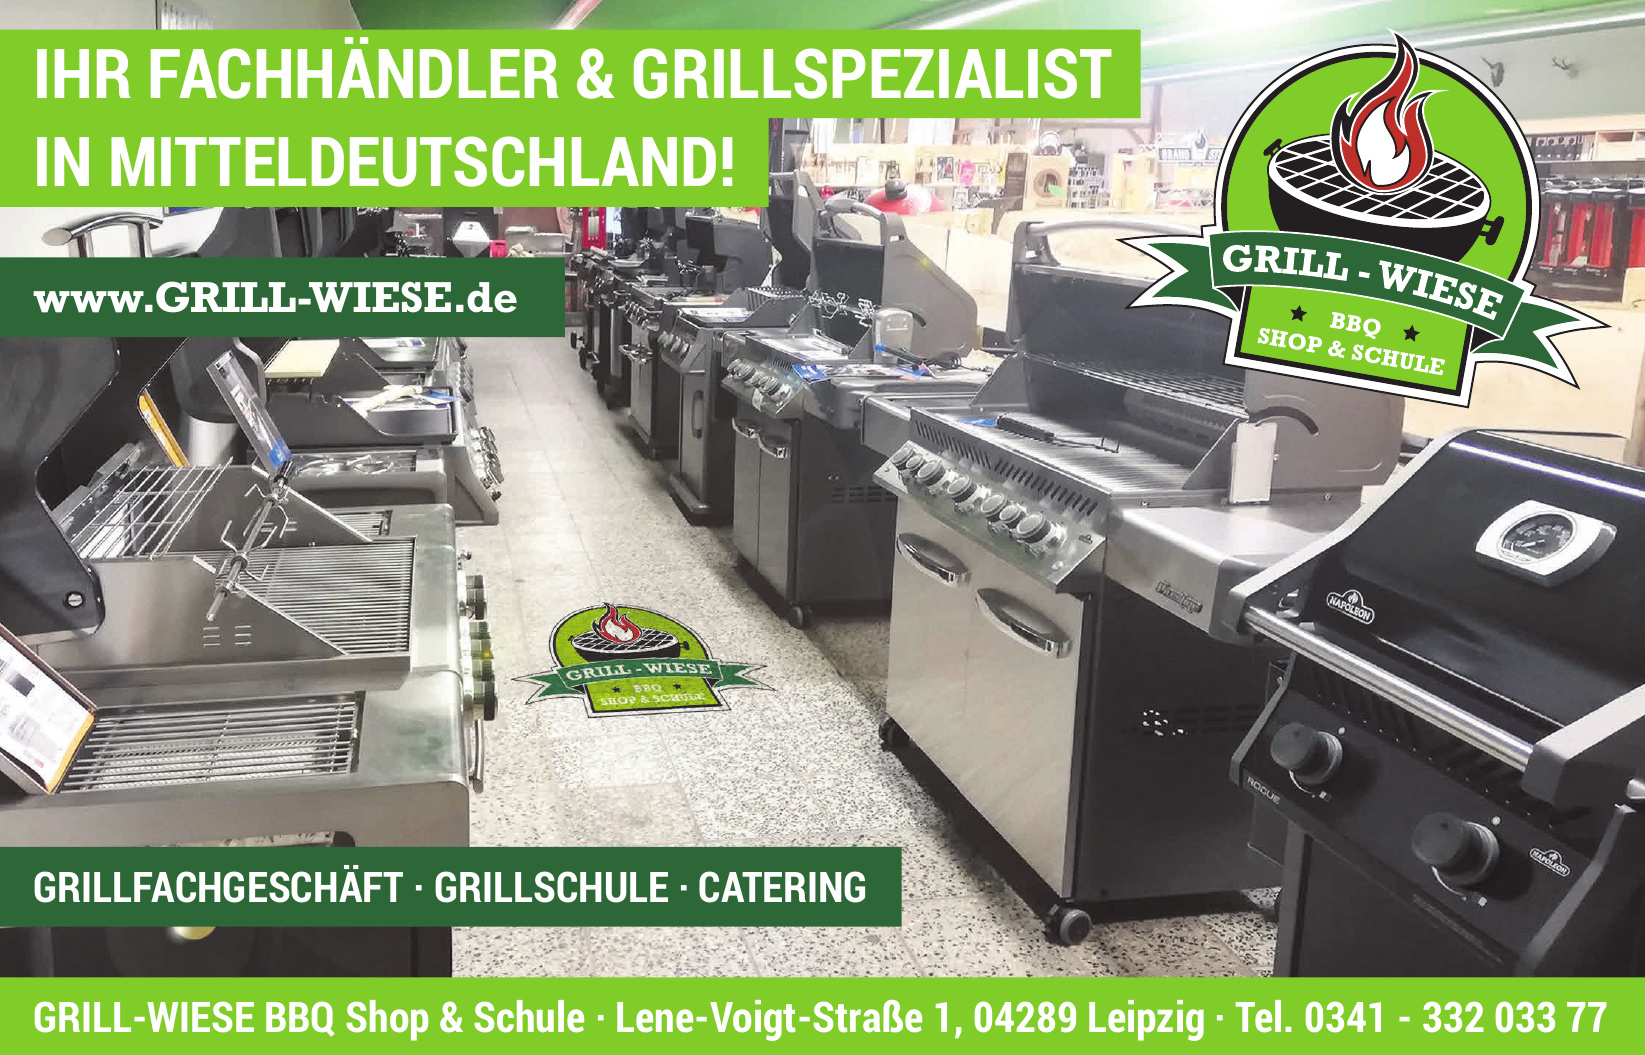 Grill-Wiese BBQ Shop & Schule